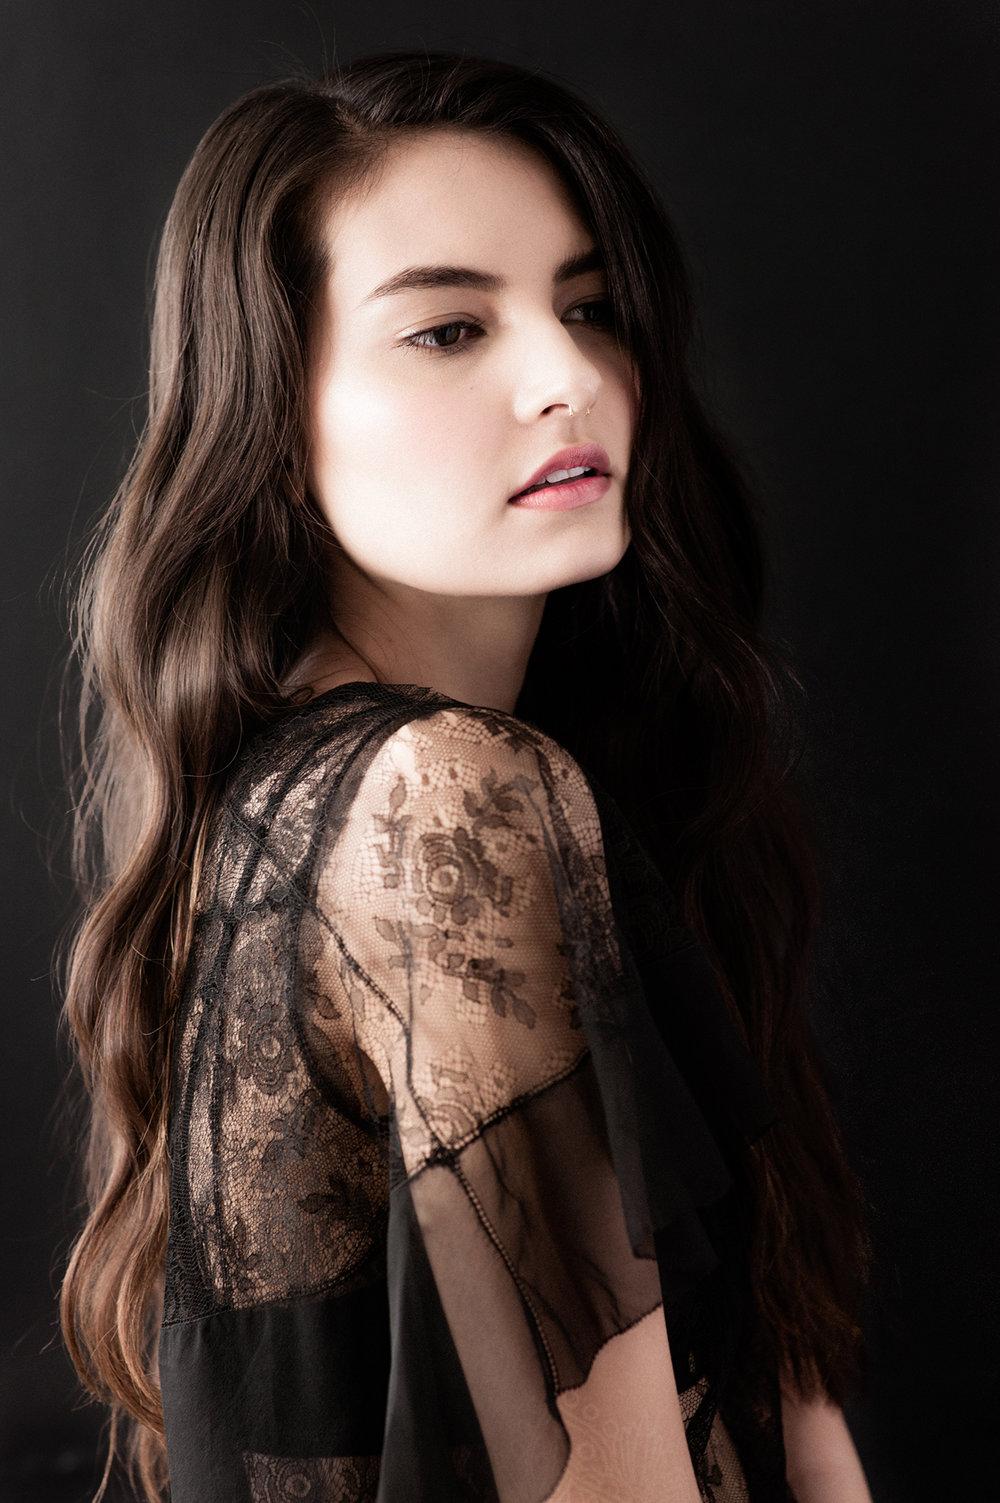 Sydney is wearing a Vintage 1930s Black Lace Dress and Botanica Workshop Aya Longline Bralette.